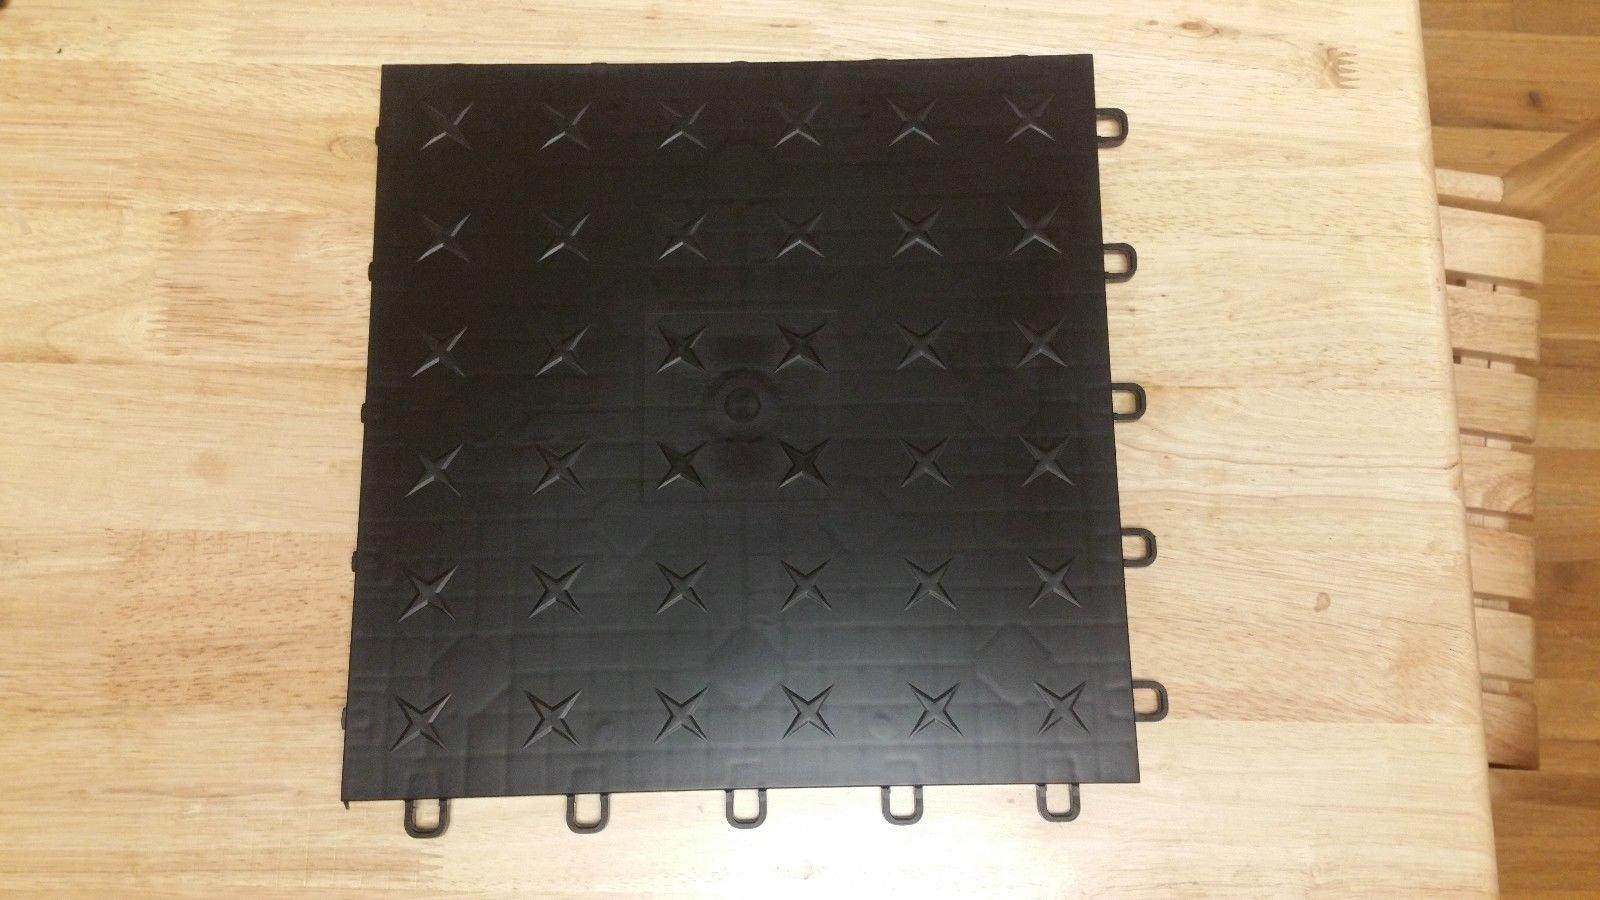 JSP Plastic Black Garage Tile Garage Floor Tiles Interlocking Basement Mat Black Diamond plate Made in USA (100) by JSP Manufacturing (Image #1)